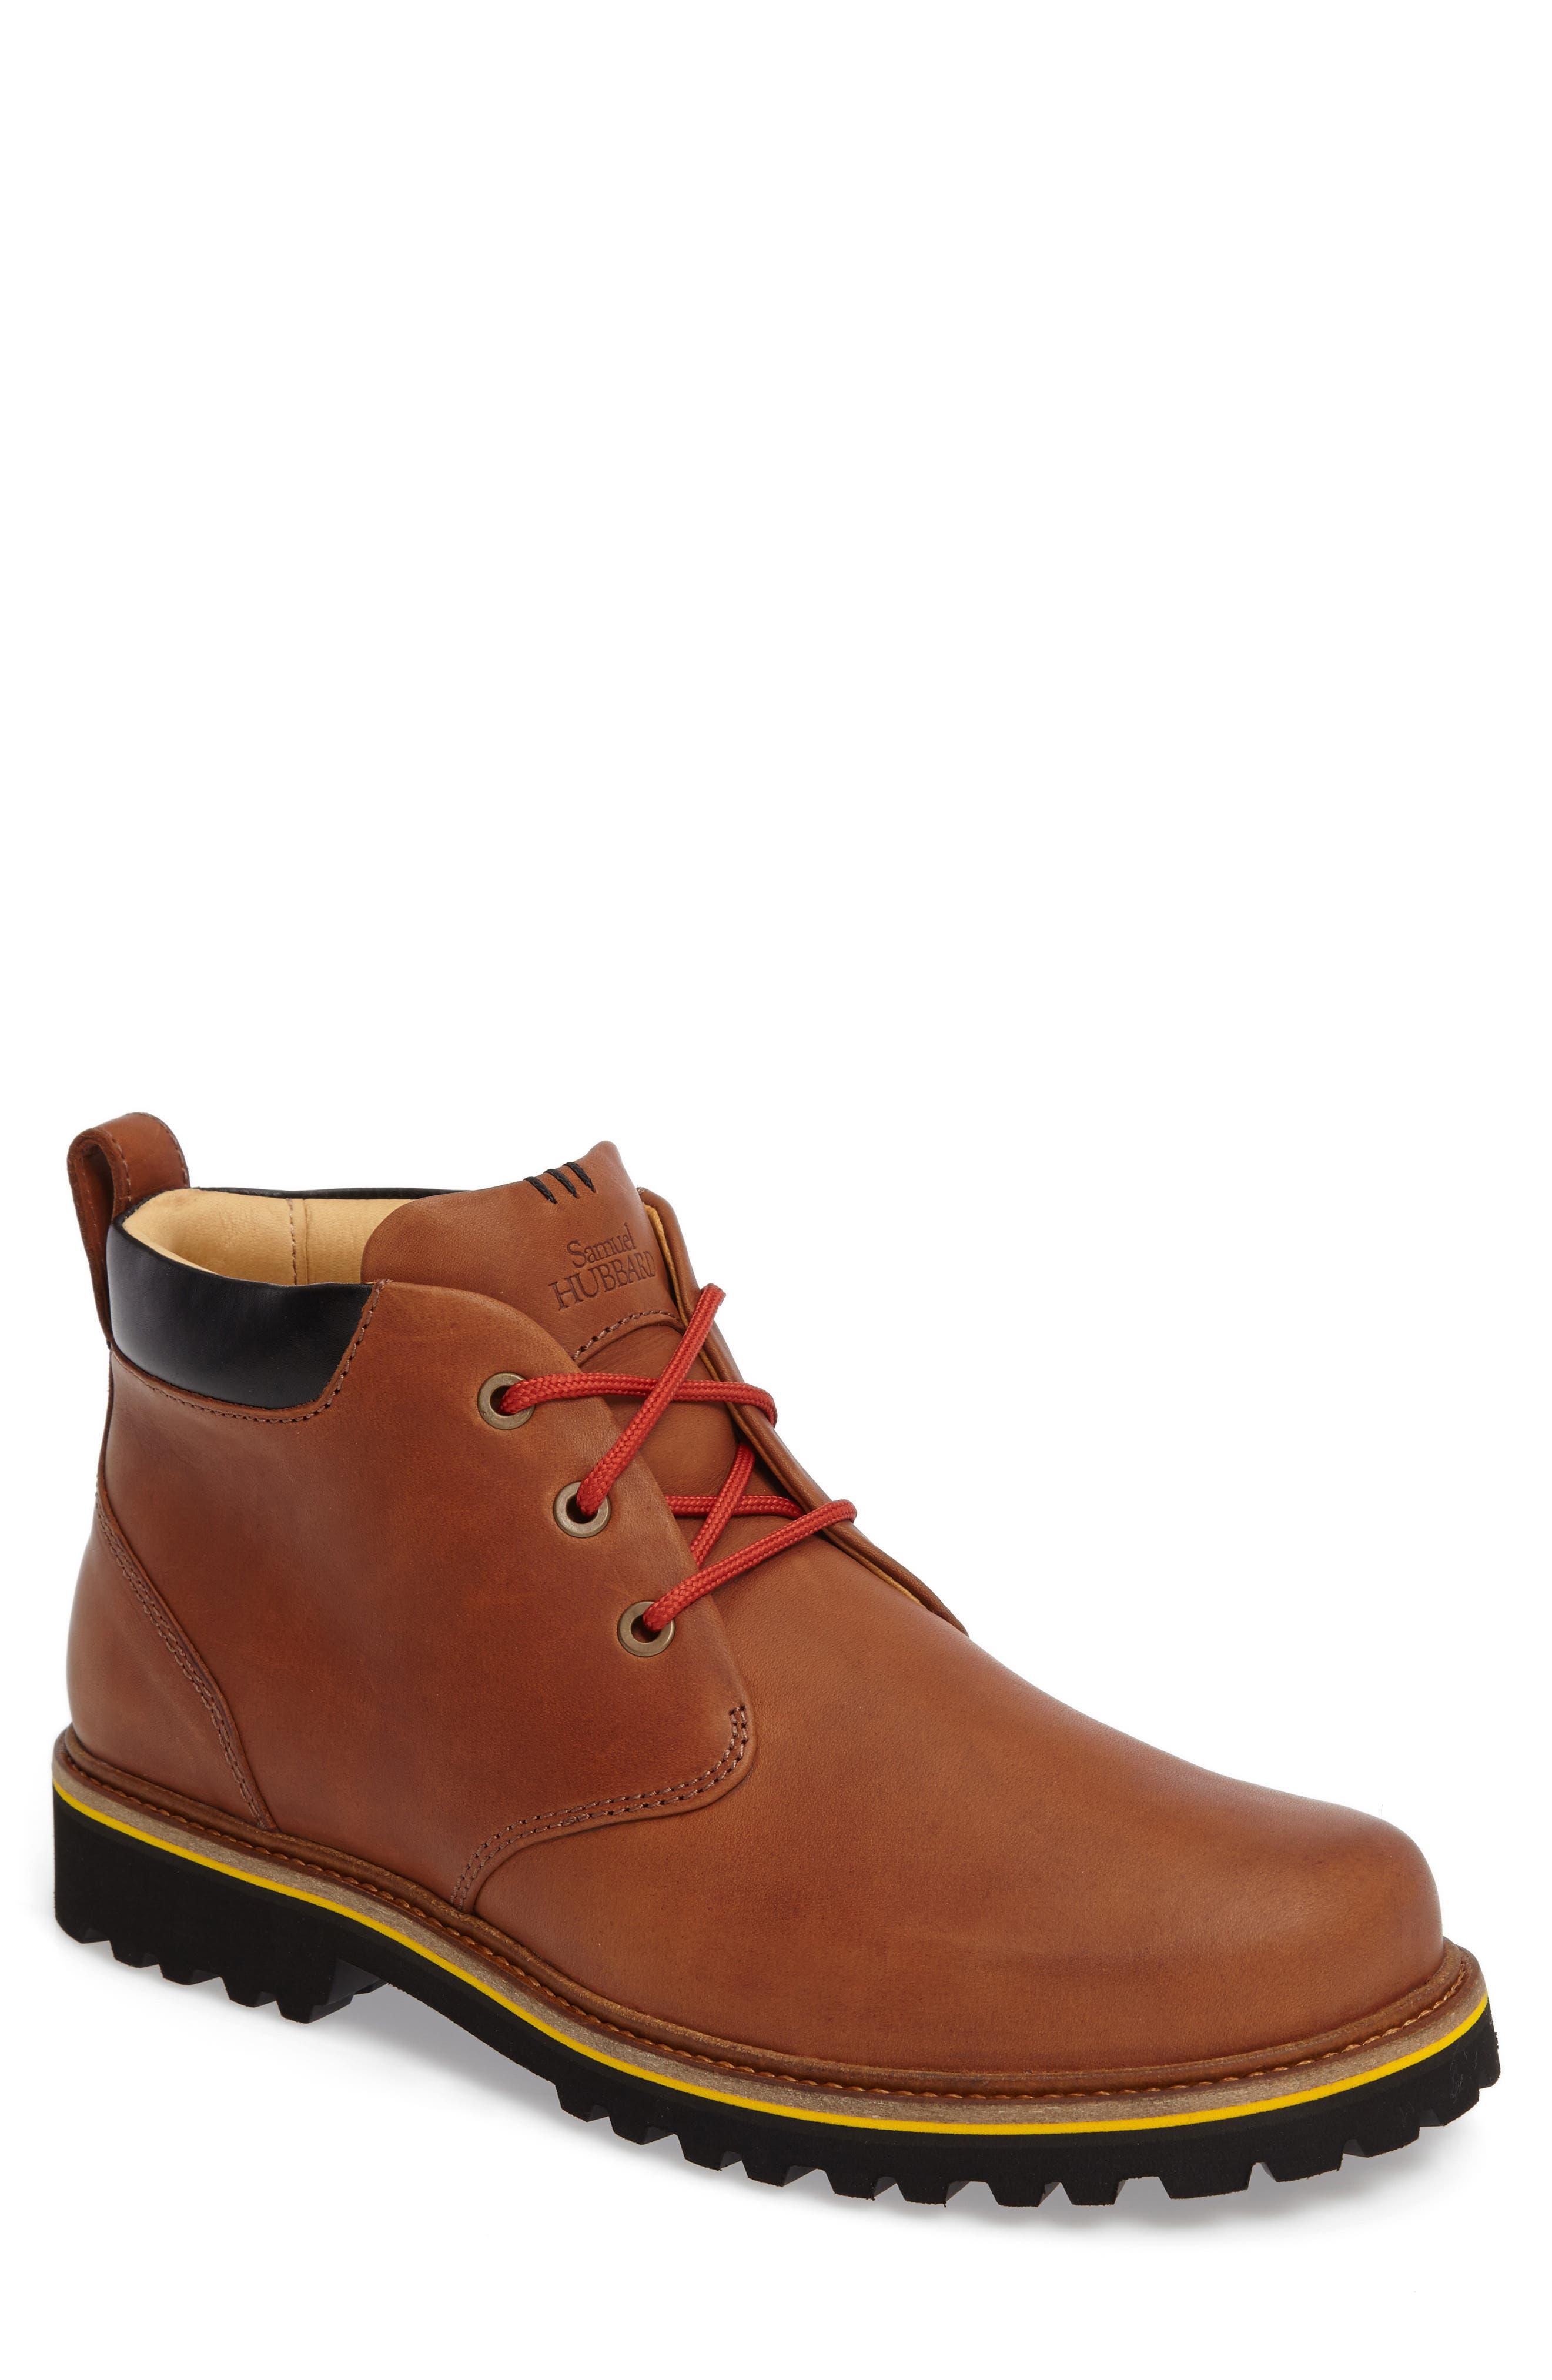 SAMUEL HUBBARD Northcoast Chukka Boot